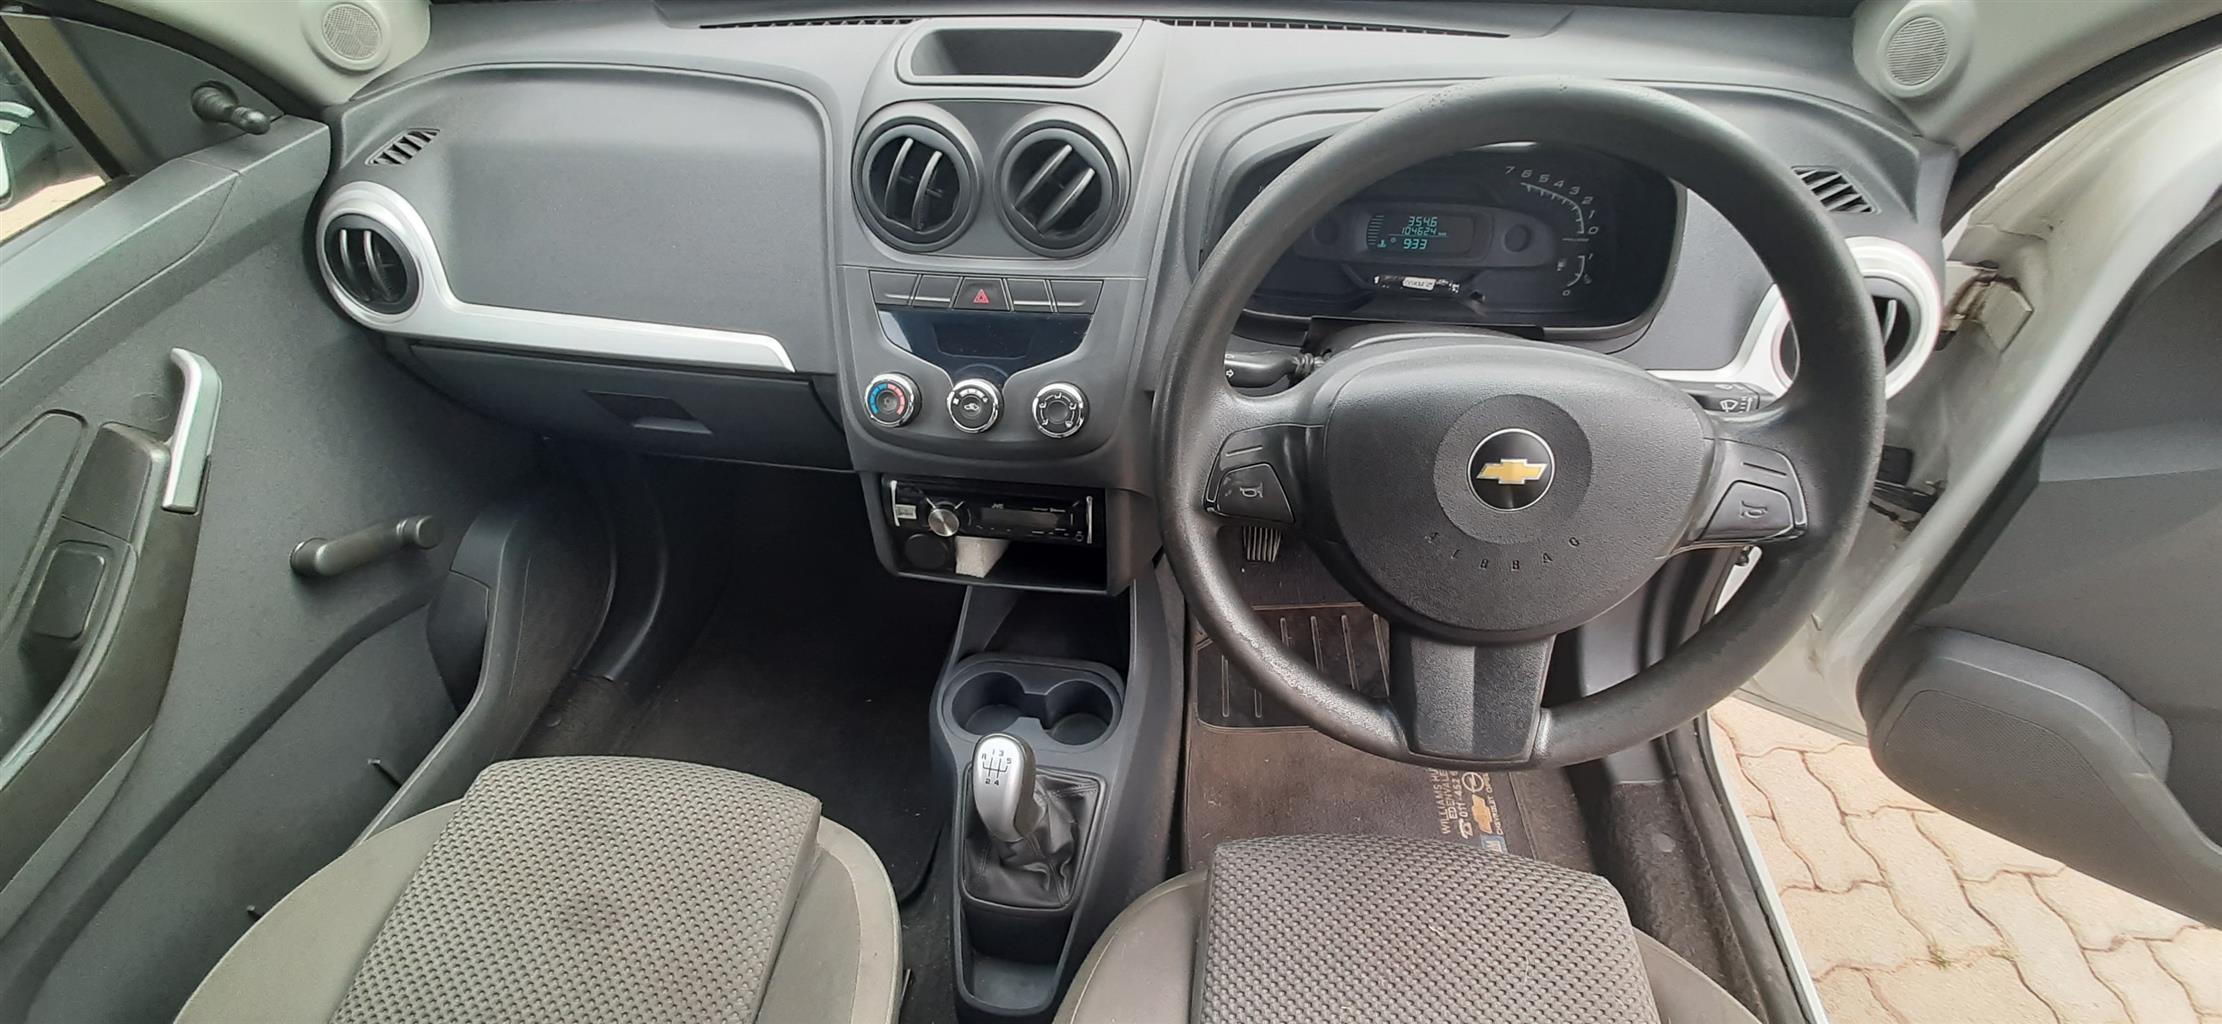 2015 Chevrolet Utility 1.4 (aircon)